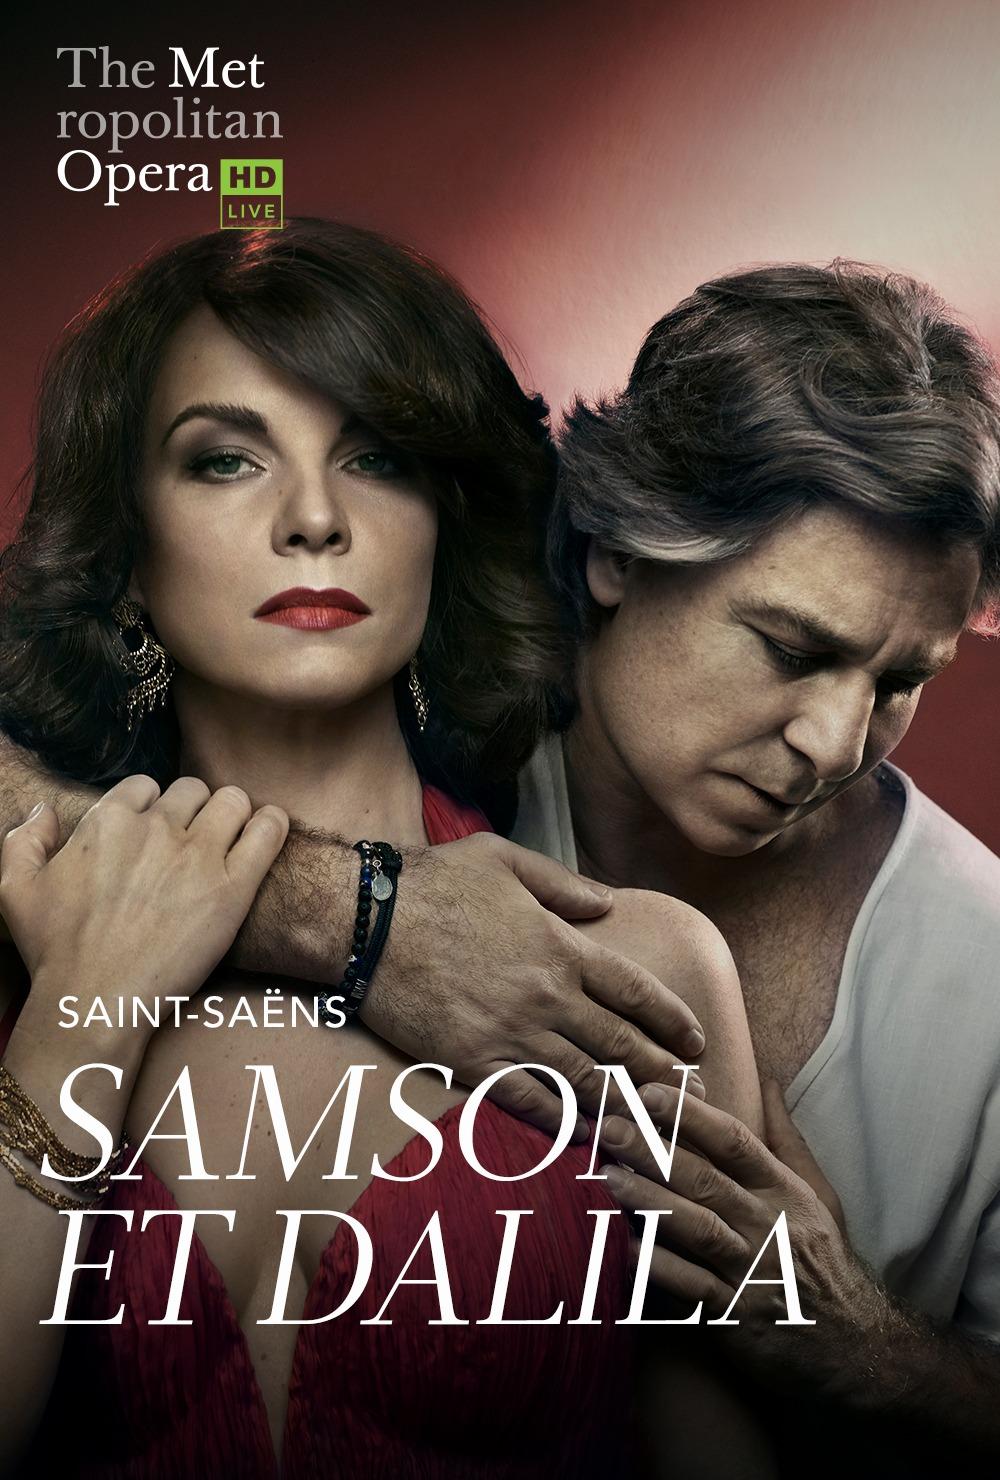 Met-Samson Et Dalila-Live